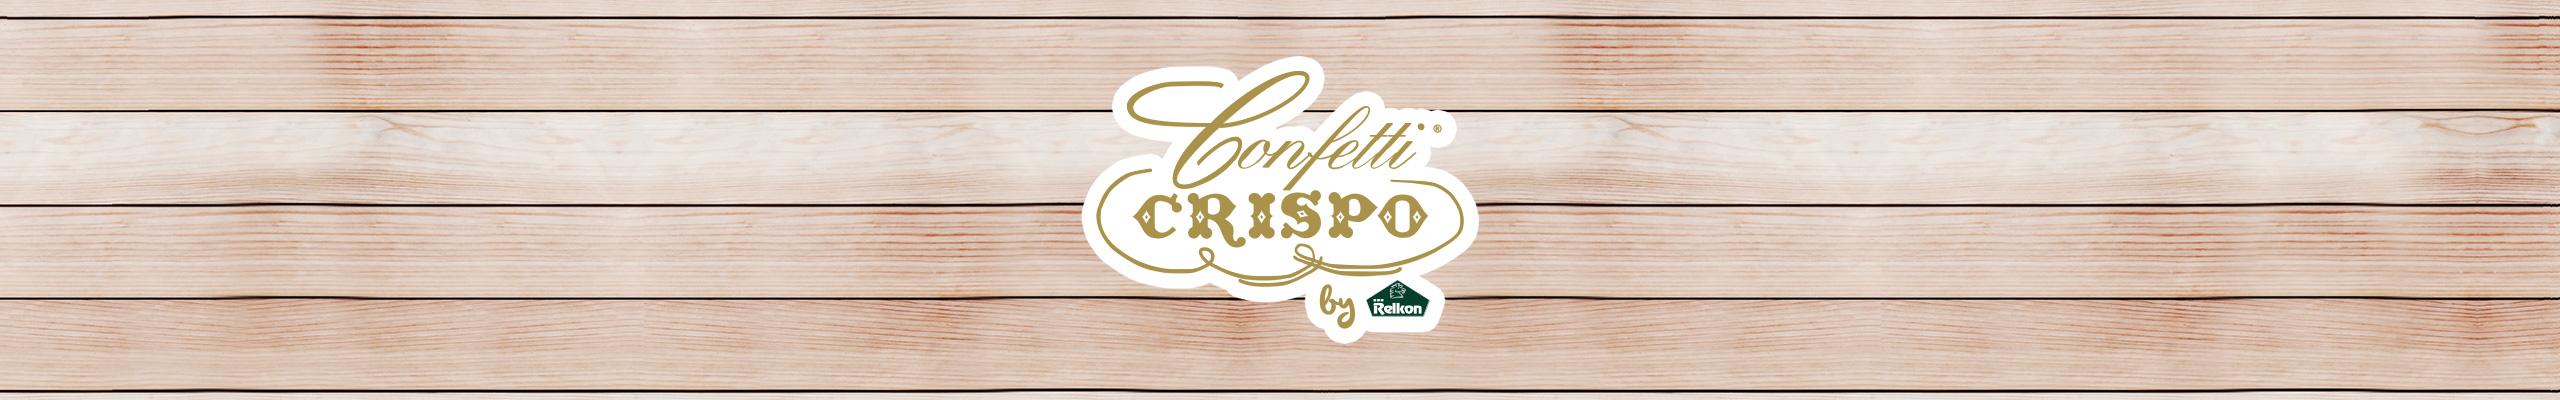 Crispo Promotional Stands